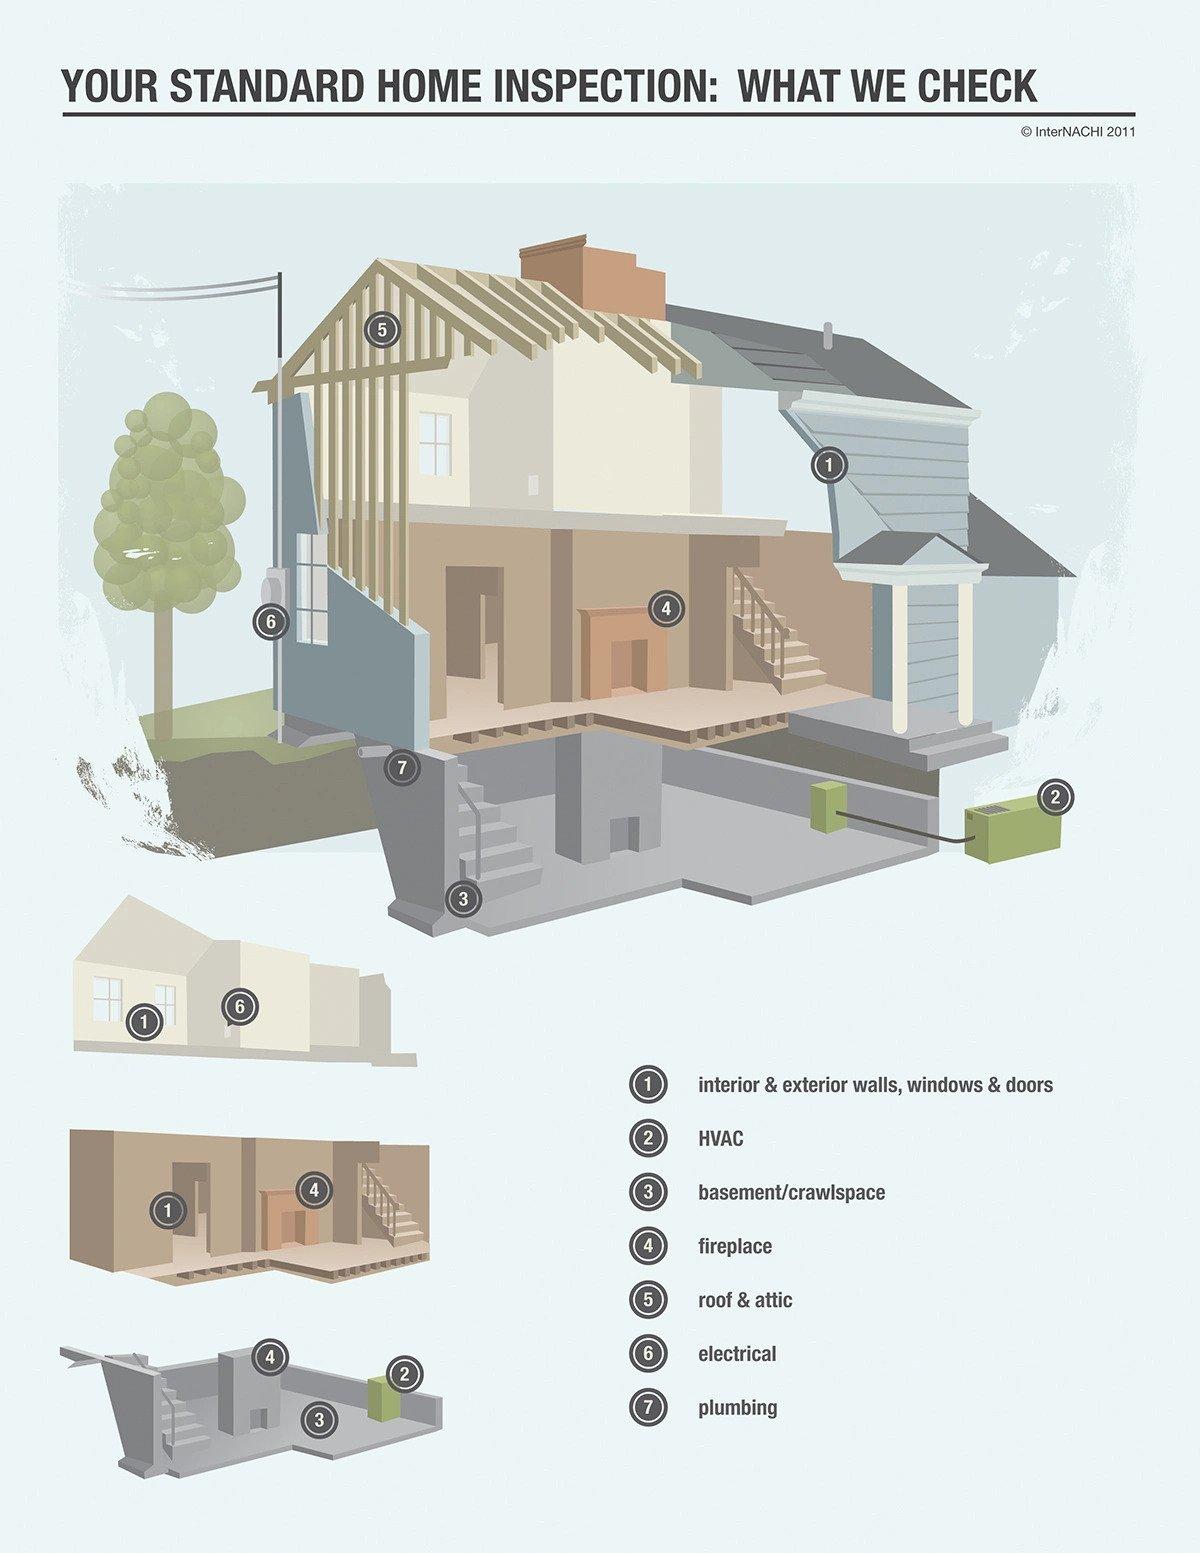 Standard home inspection checklist